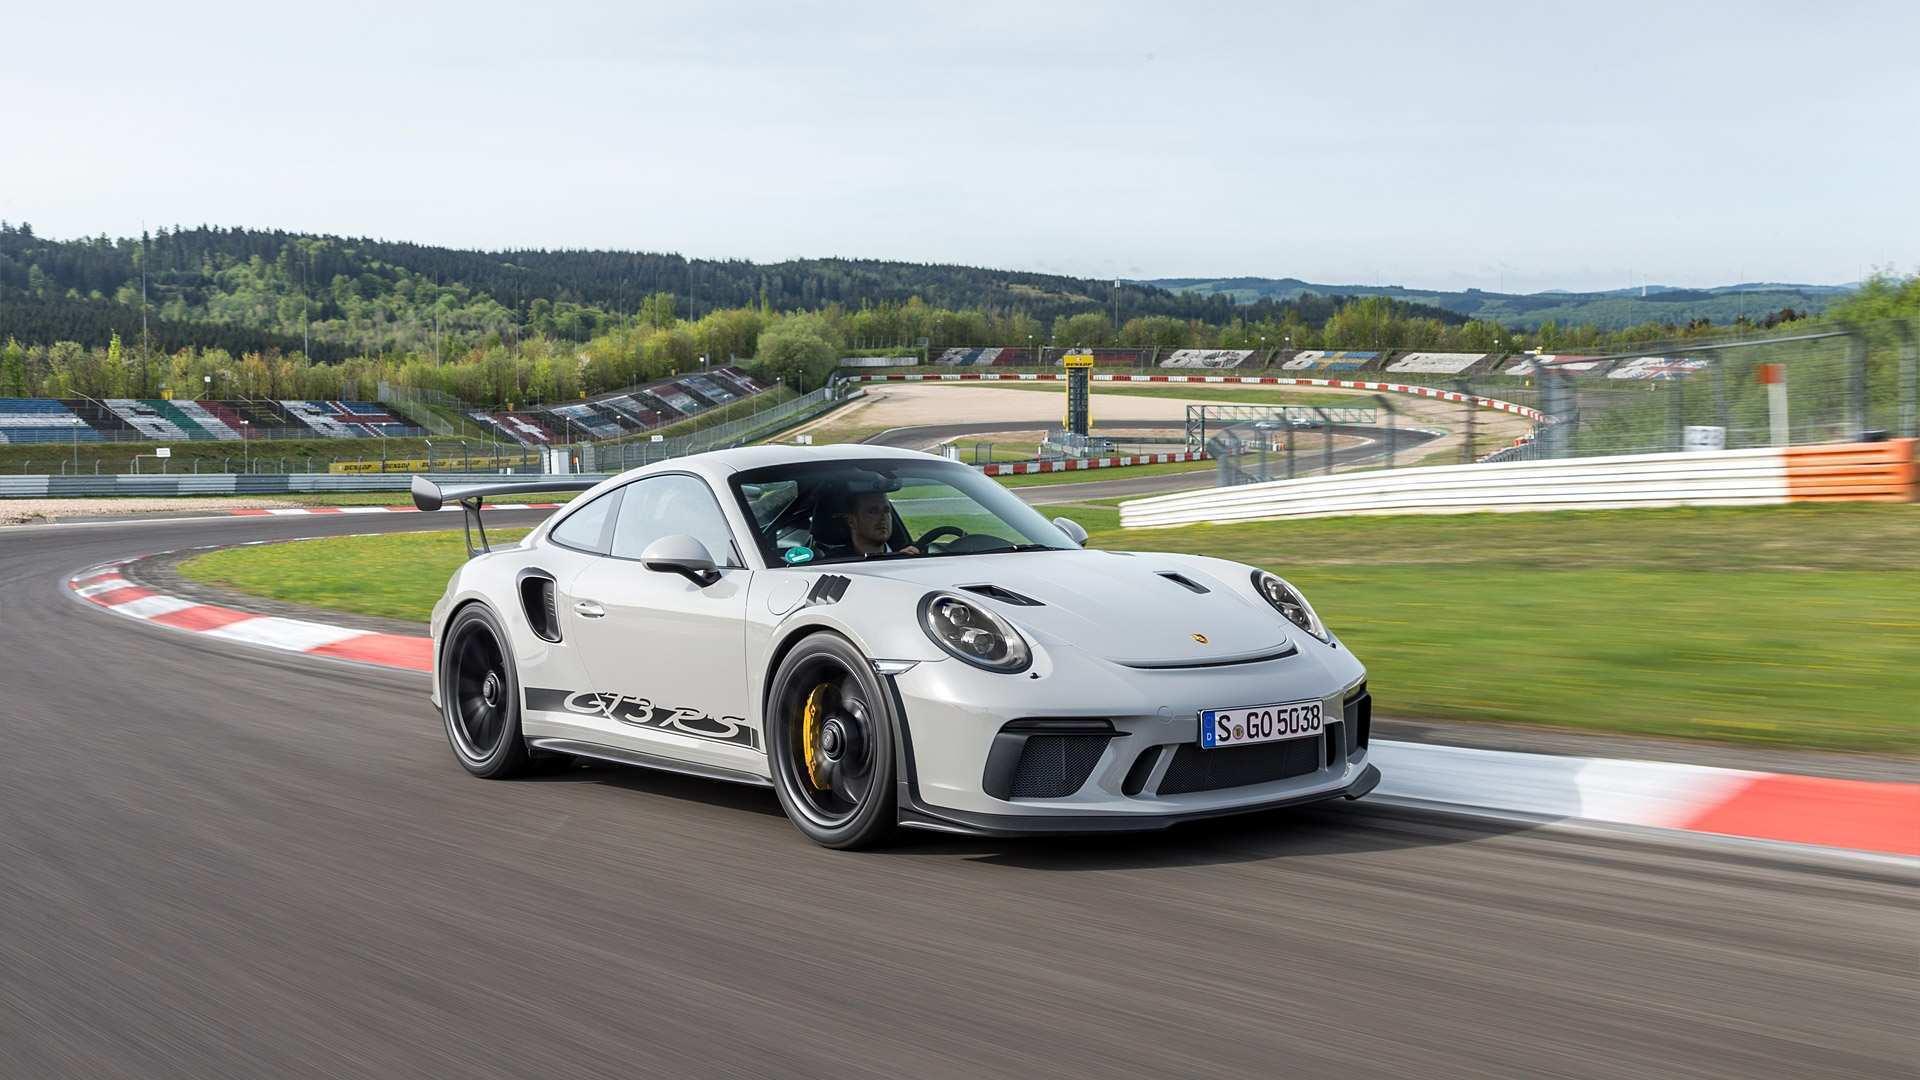 64 Best Review 2019 Porsche Release Date Photos by 2019 Porsche Release Date